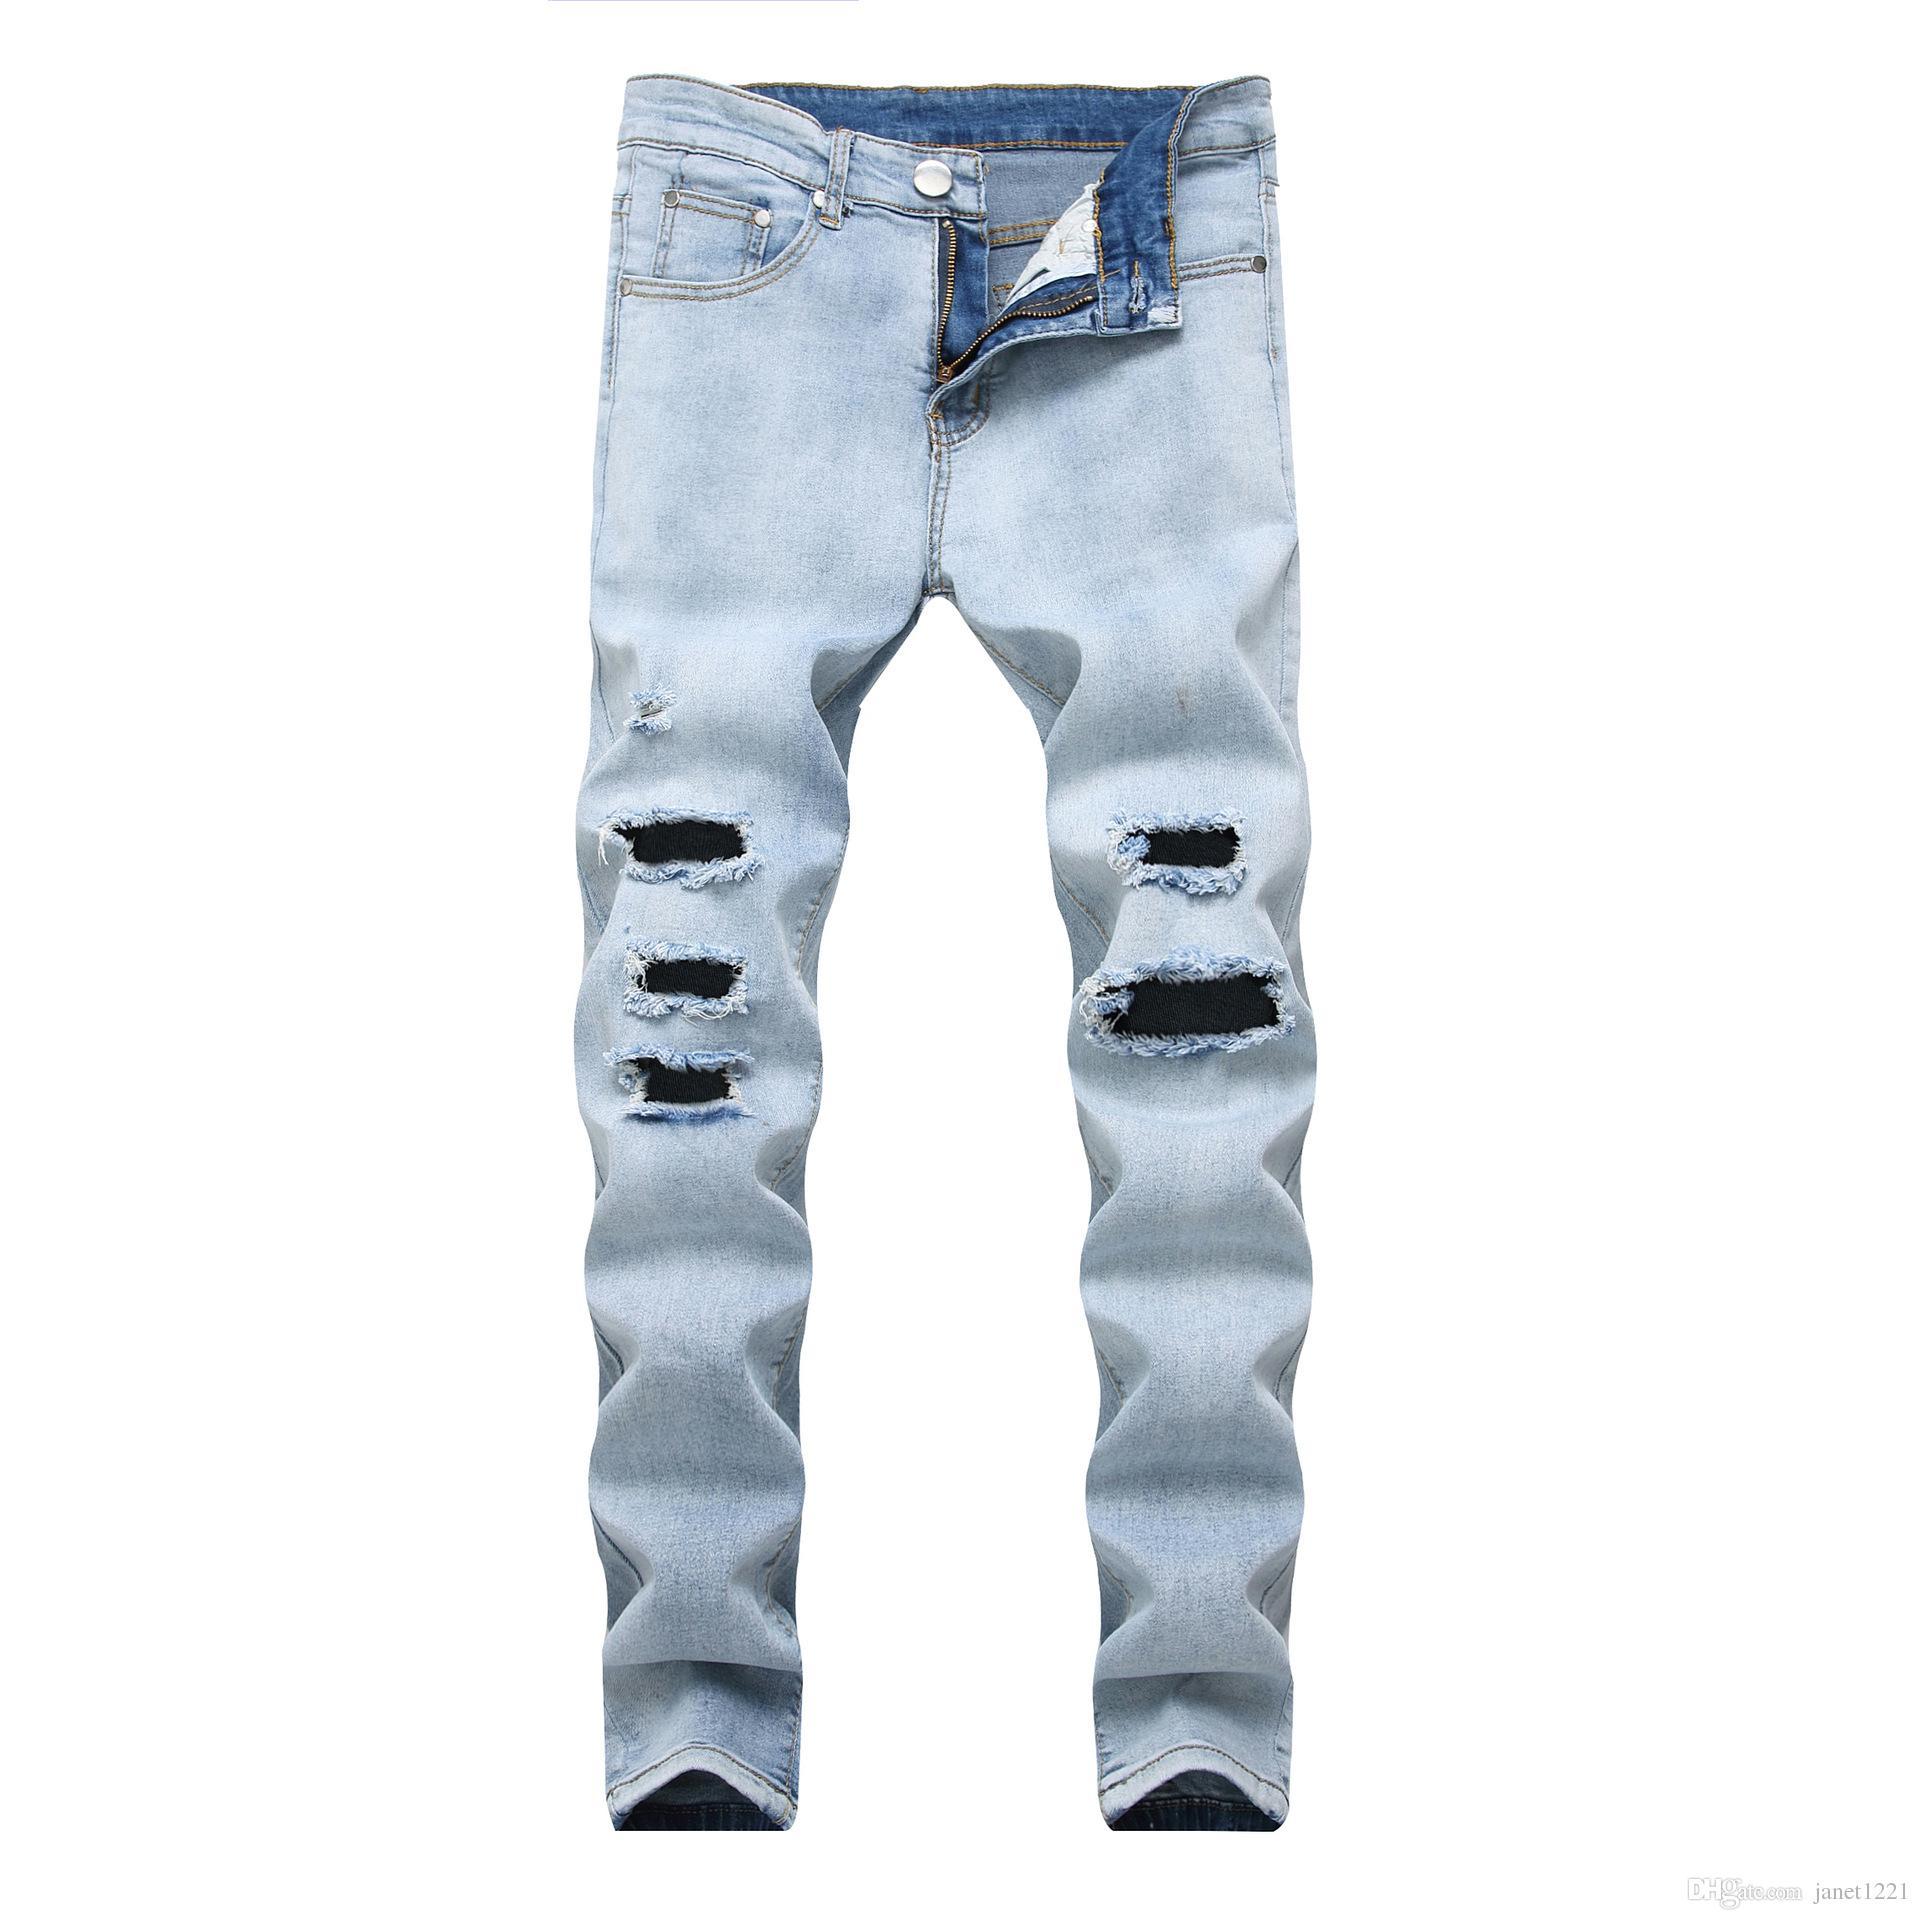 0b0ff4116 Sky Blue Ripped Jeans Hombres Otoño Marca Hip Hop Para Hombre Skinny Jeans  Homme Slim Fit Biker Jeans Pantalones J180719